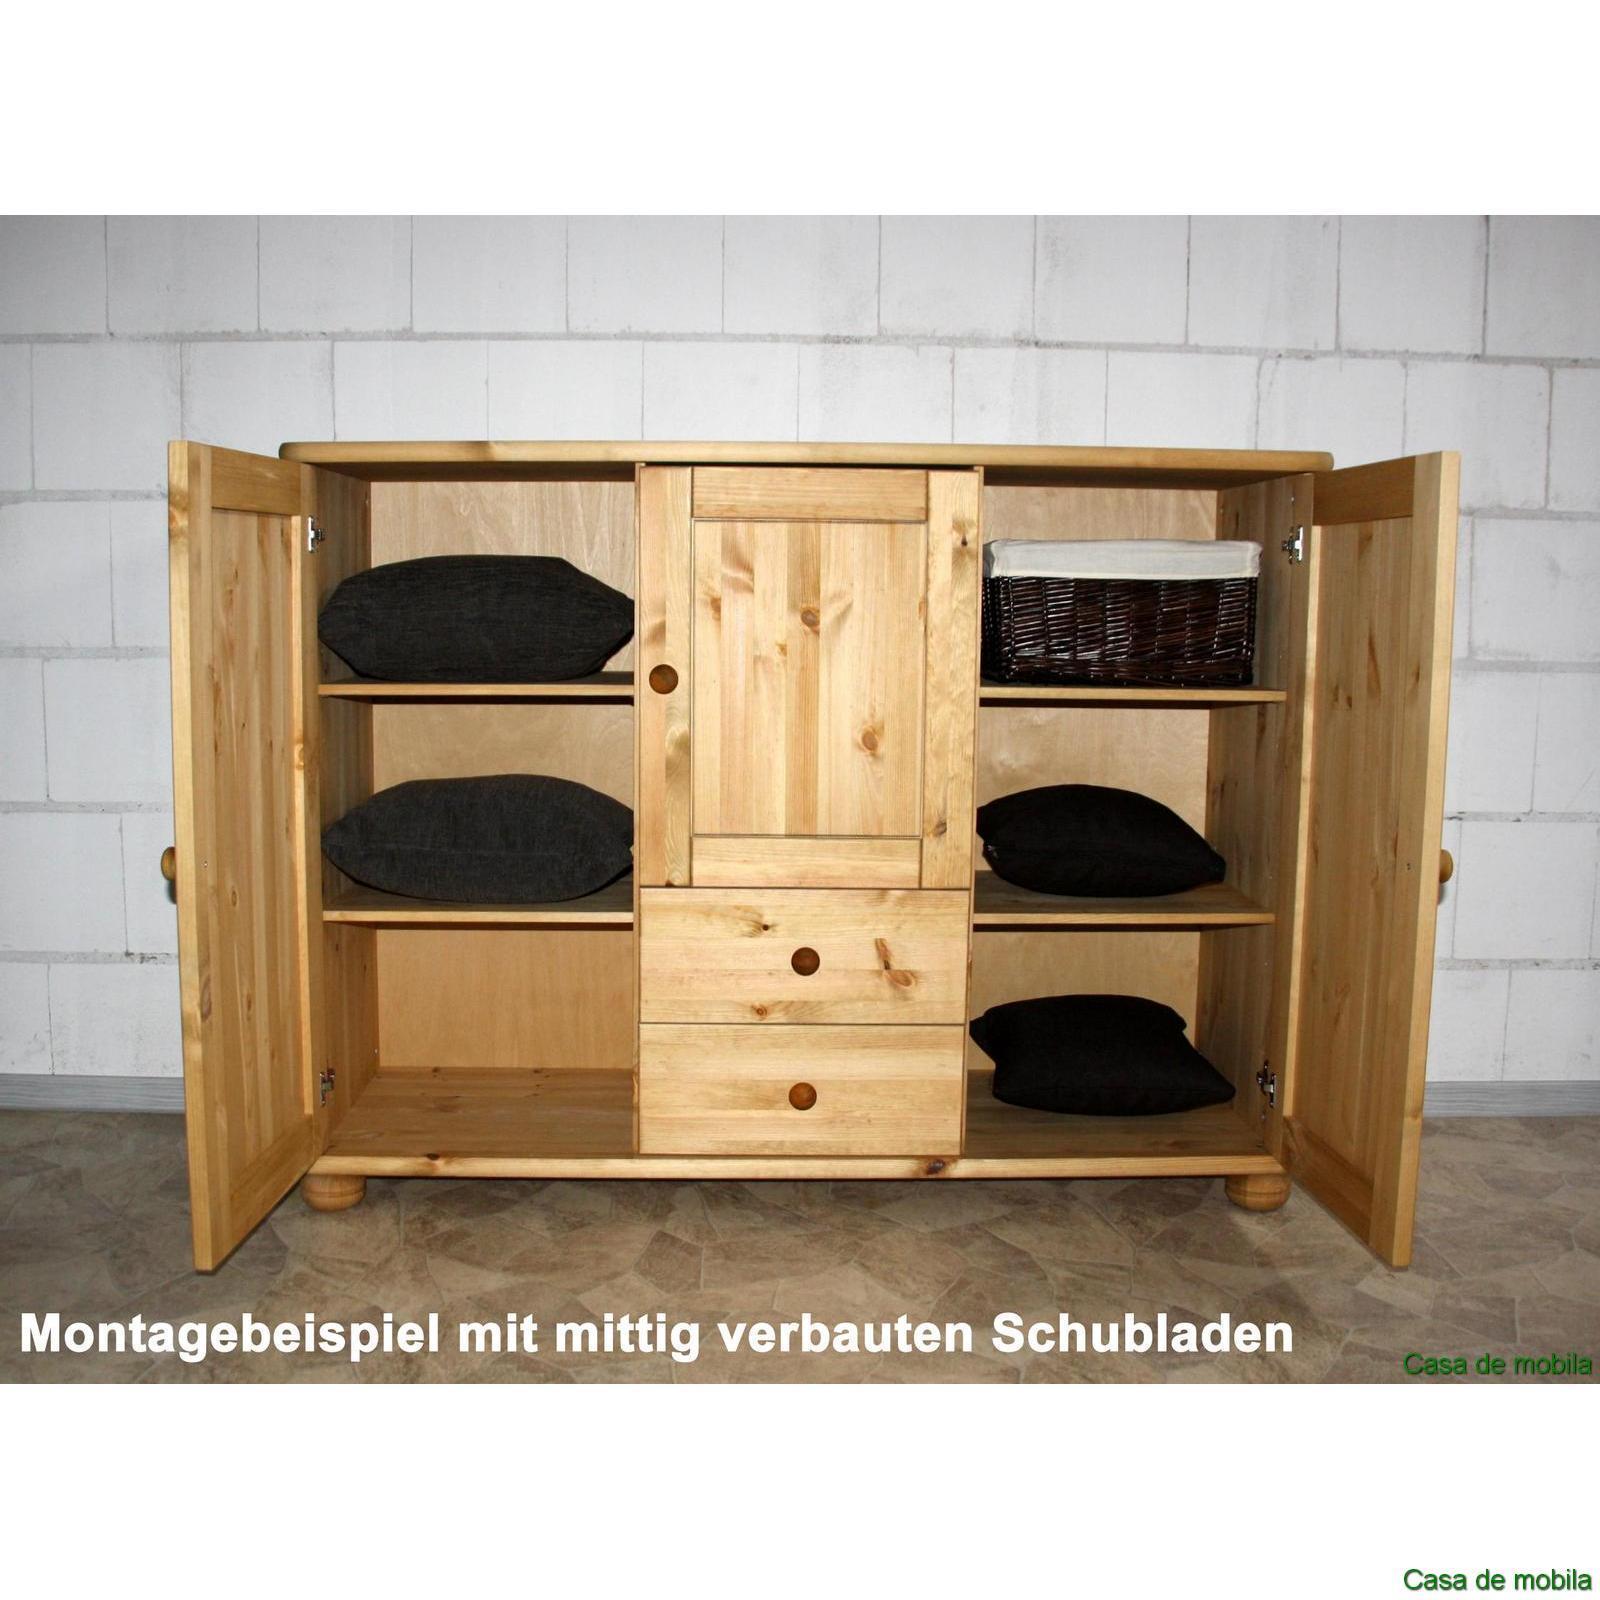 Kommode Kiefer Massiv Natur Lackiert : Massivholz Anrichte Kiefer massiv 2-farbig provance lackiert / weiß ...